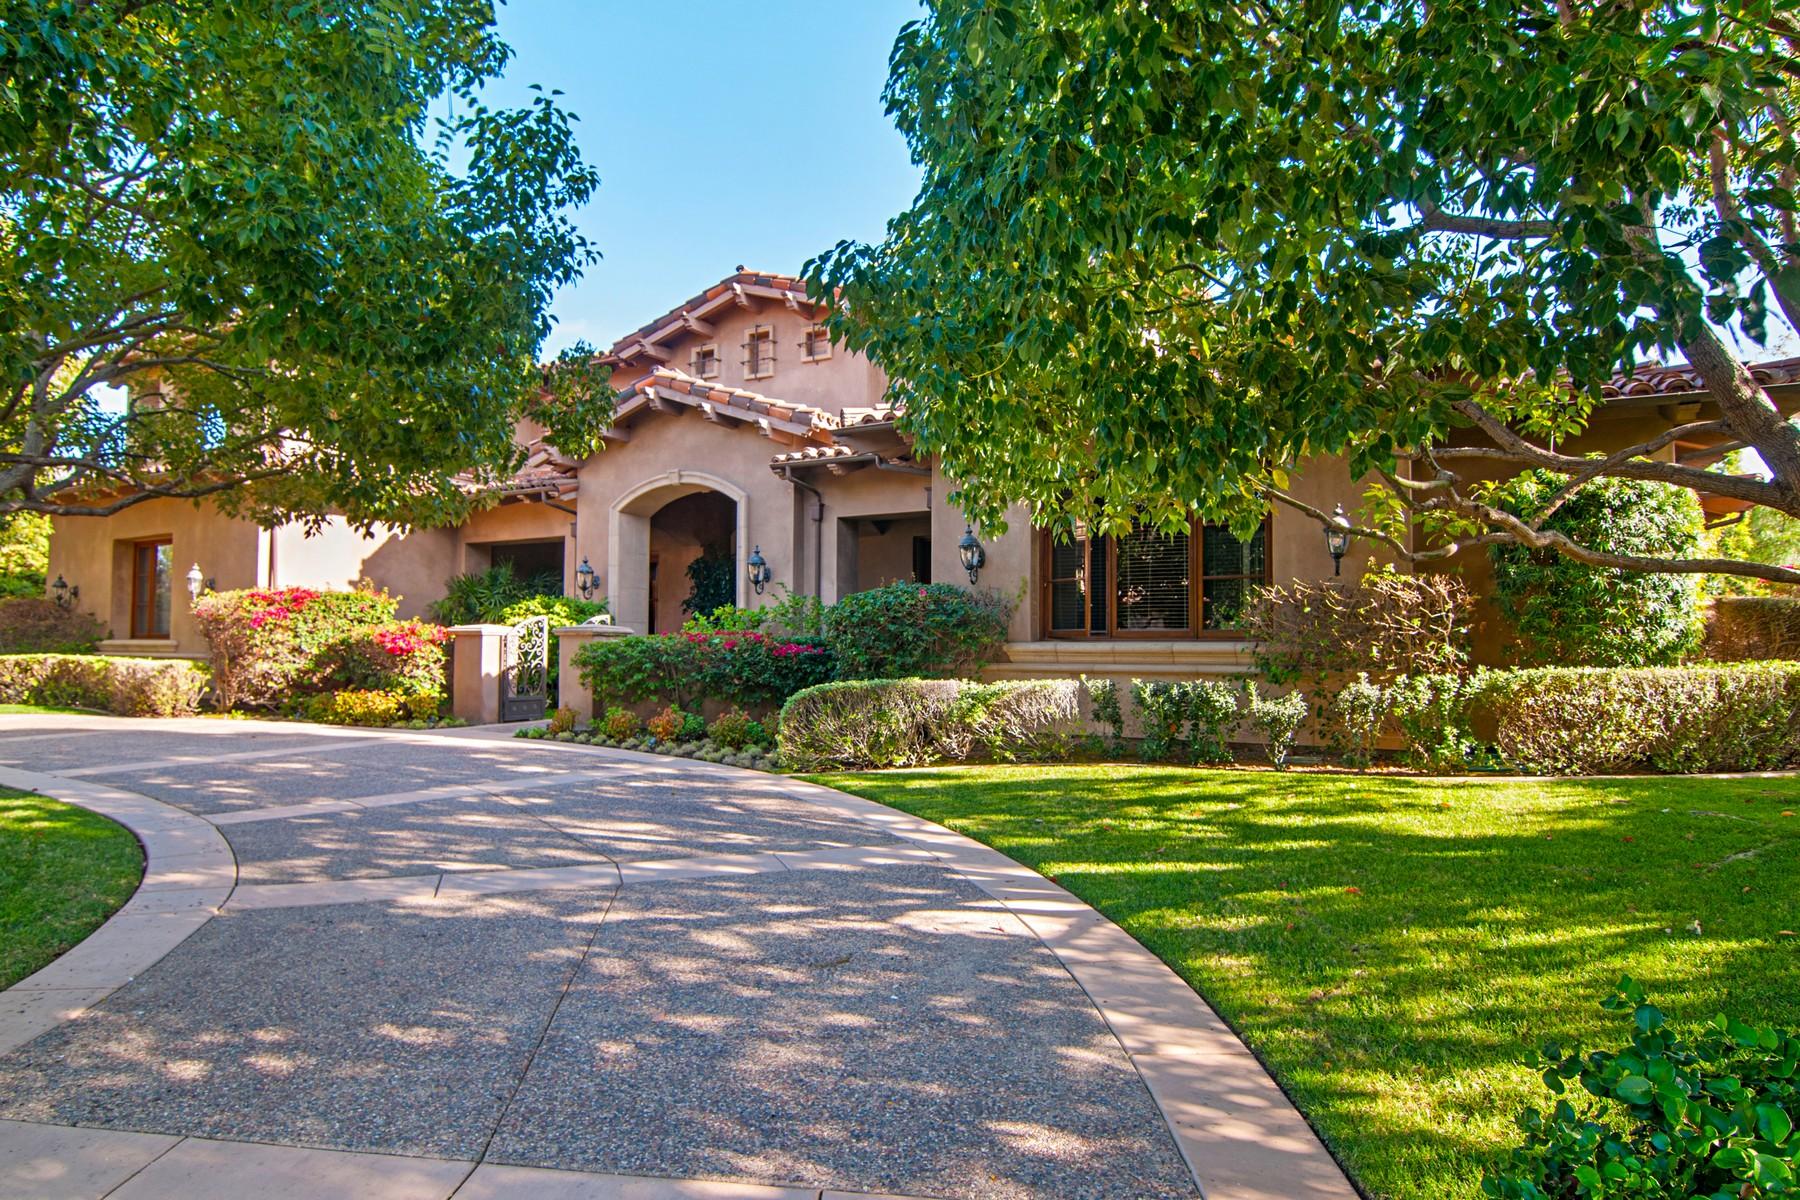 Moradia para Venda às 18451 Calle La Serra Rancho Santa Fe, Califórnia, 92067 Estados Unidos